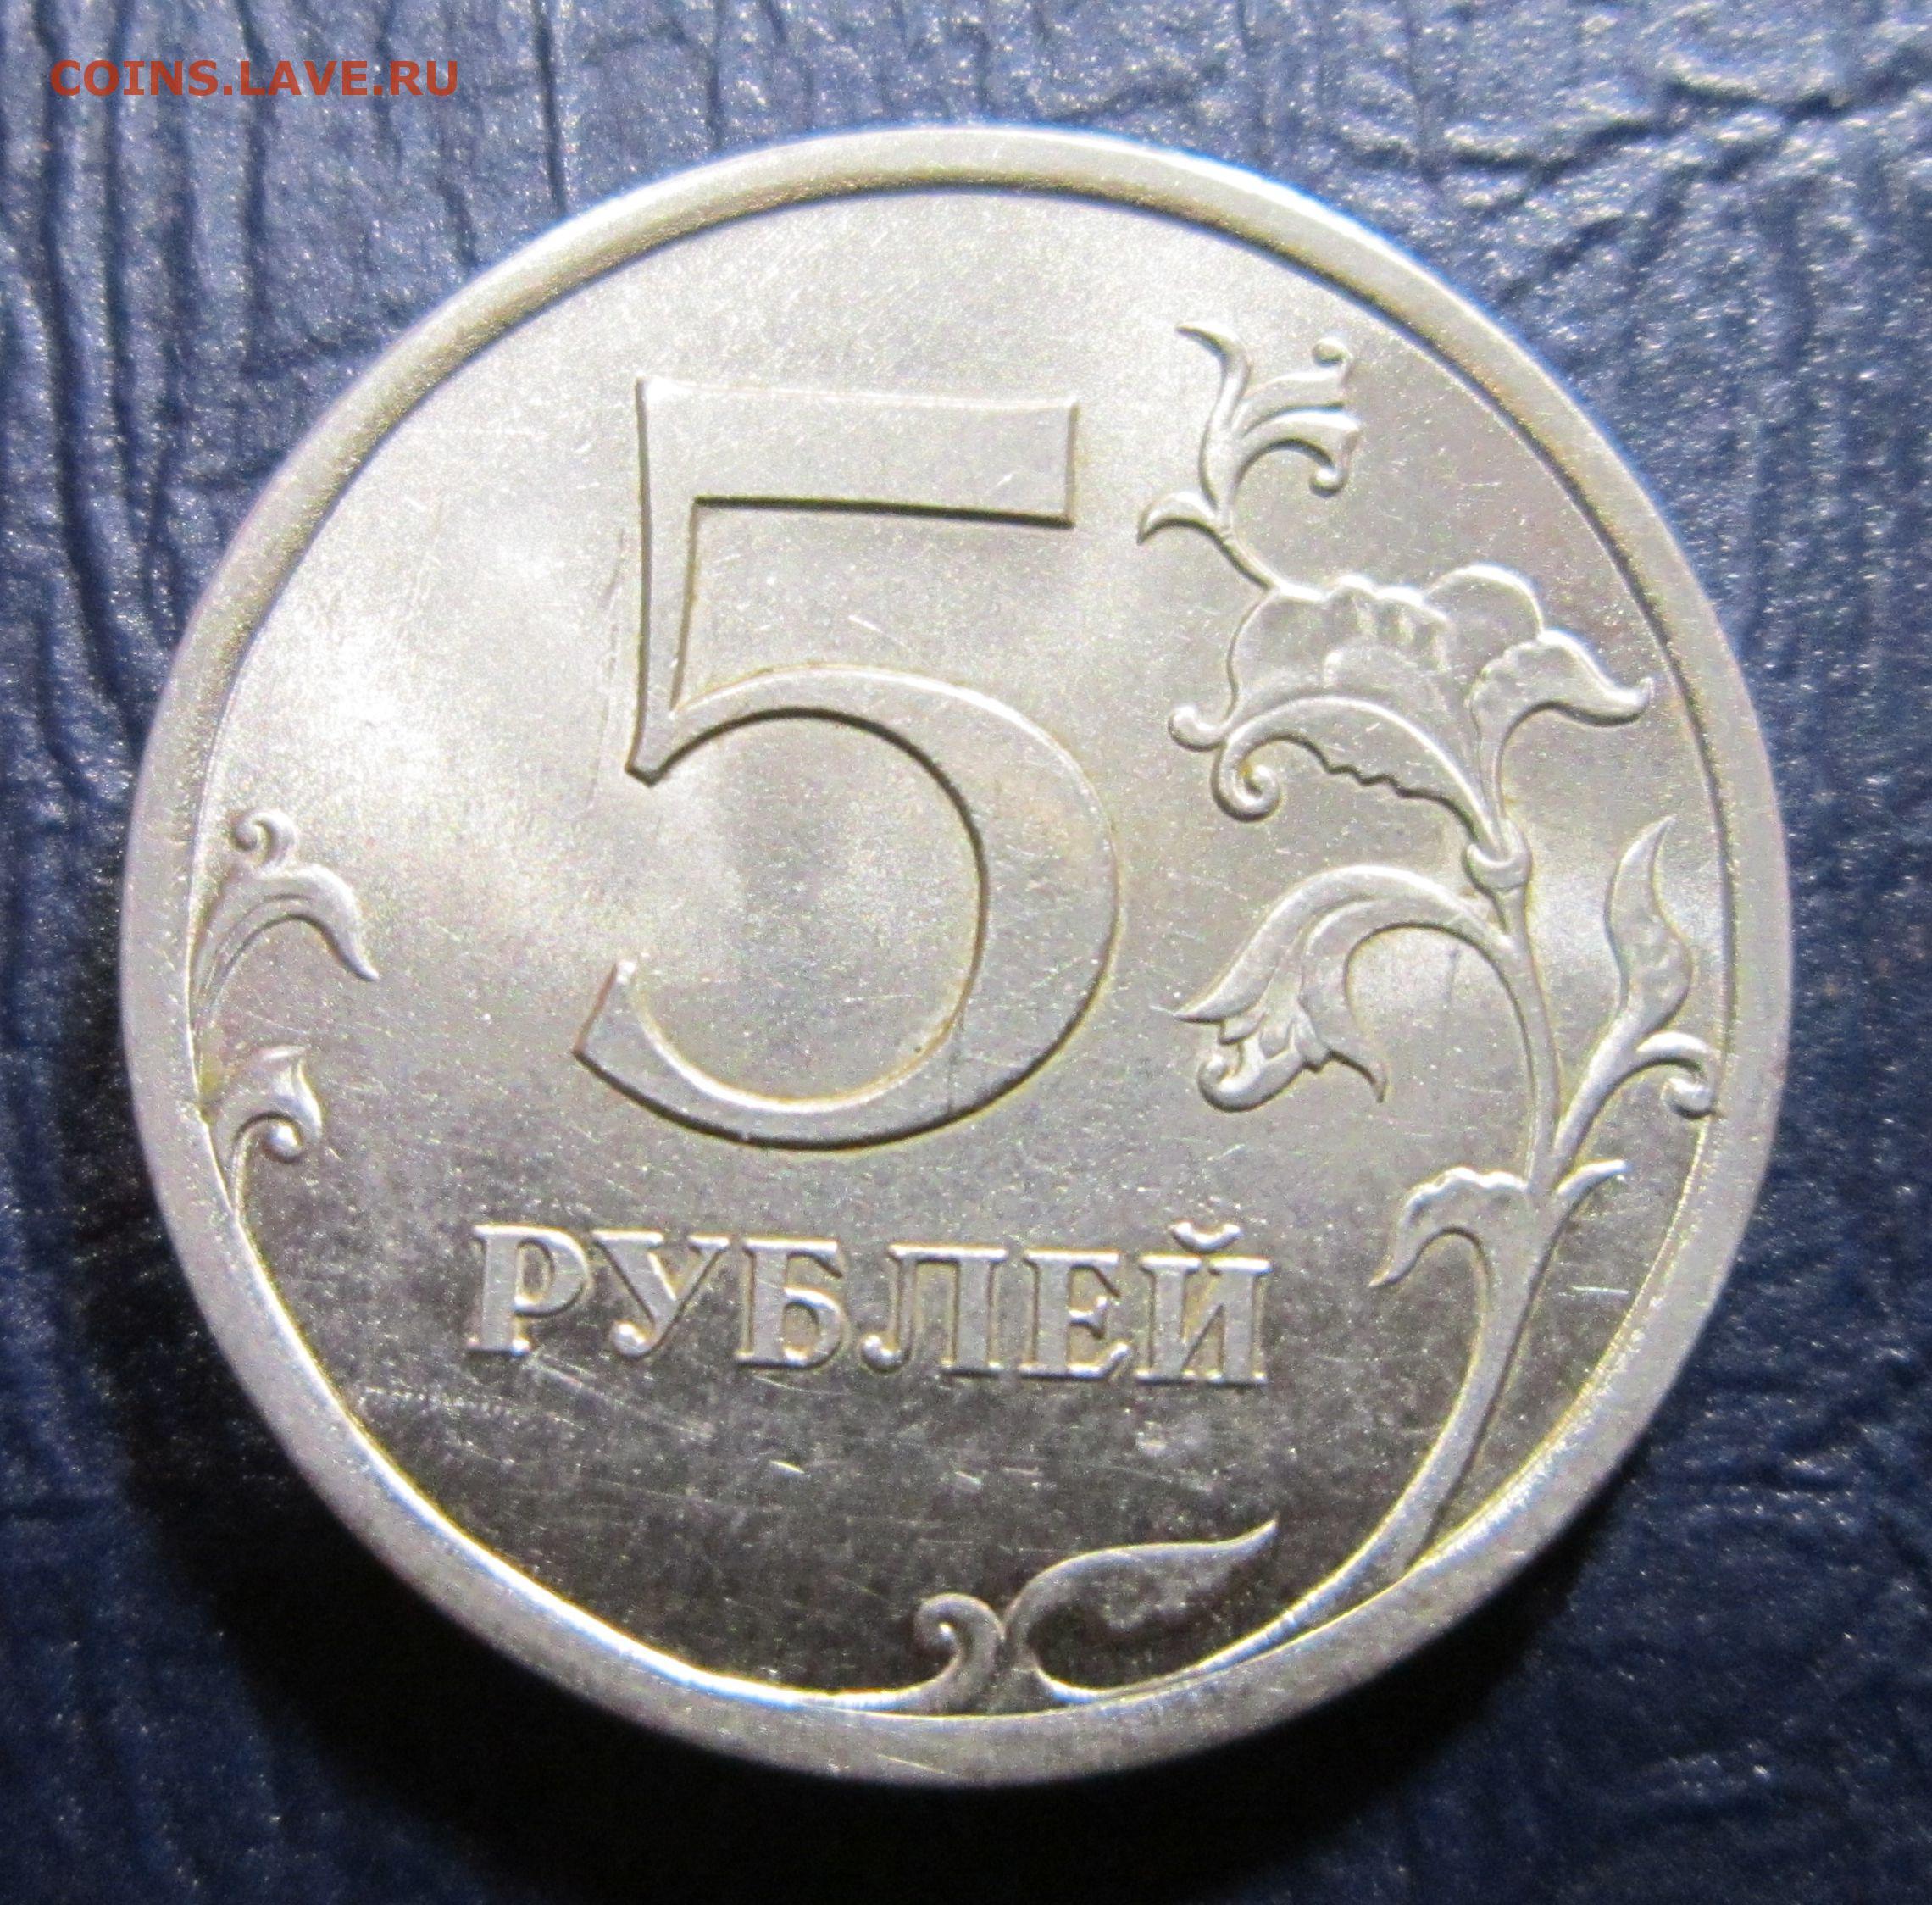 5 рублей 2010 года спмд новый молоток интернет аукцион